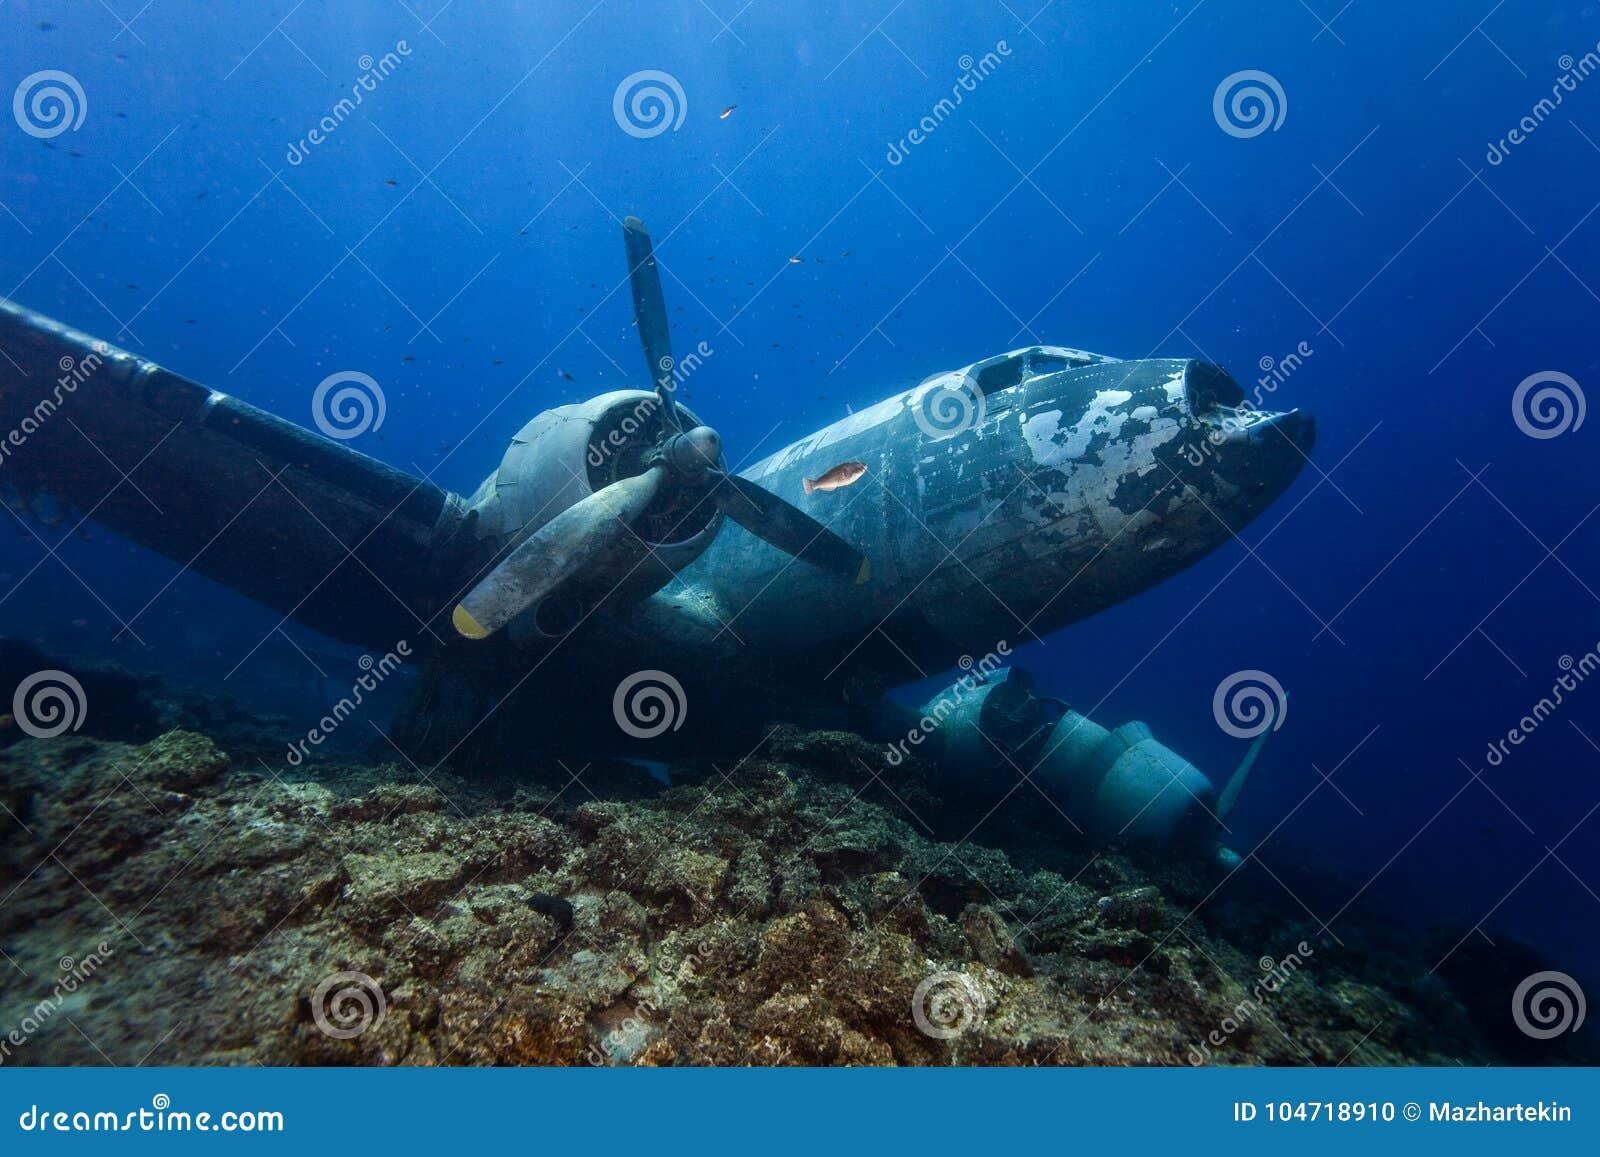 Underwater in Maldives, aircraft wreck from World War II